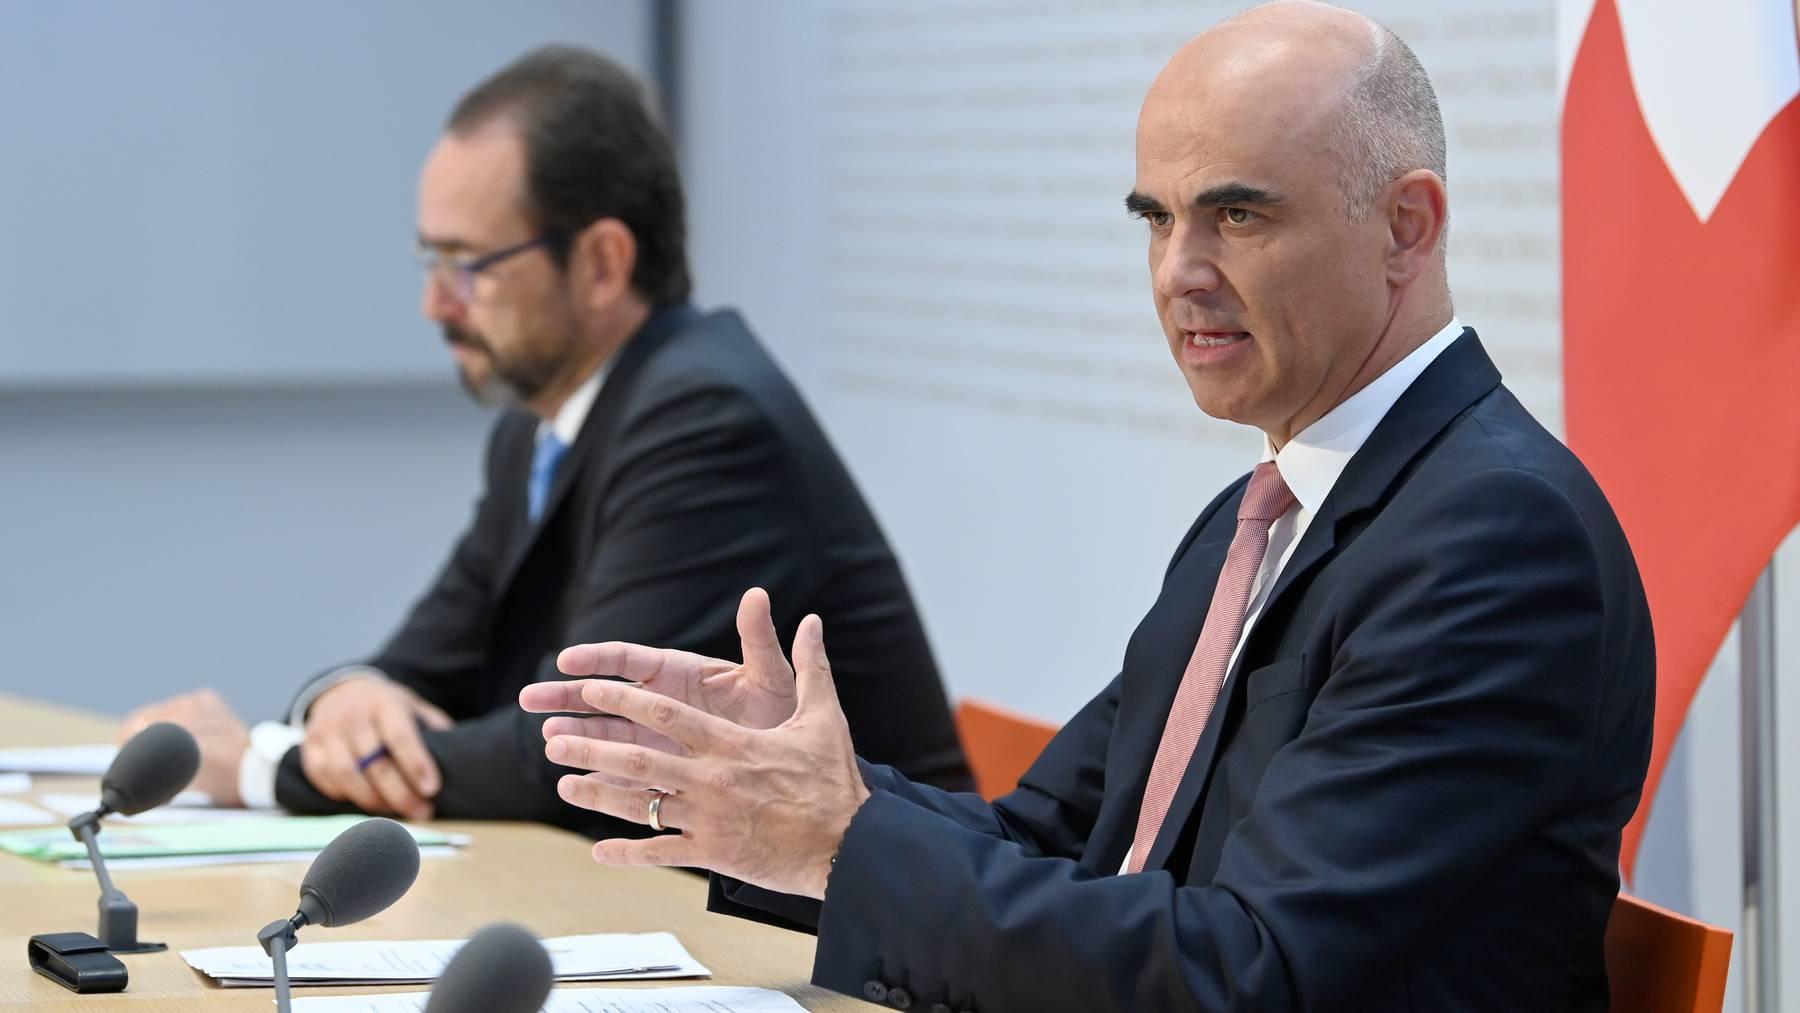 Bundesrat Alain Berset (r.) und BAG-Direktor Pascal Strupler (l.) informierten die Medien am Dienstag über die Krankenkassenprämien 2021.